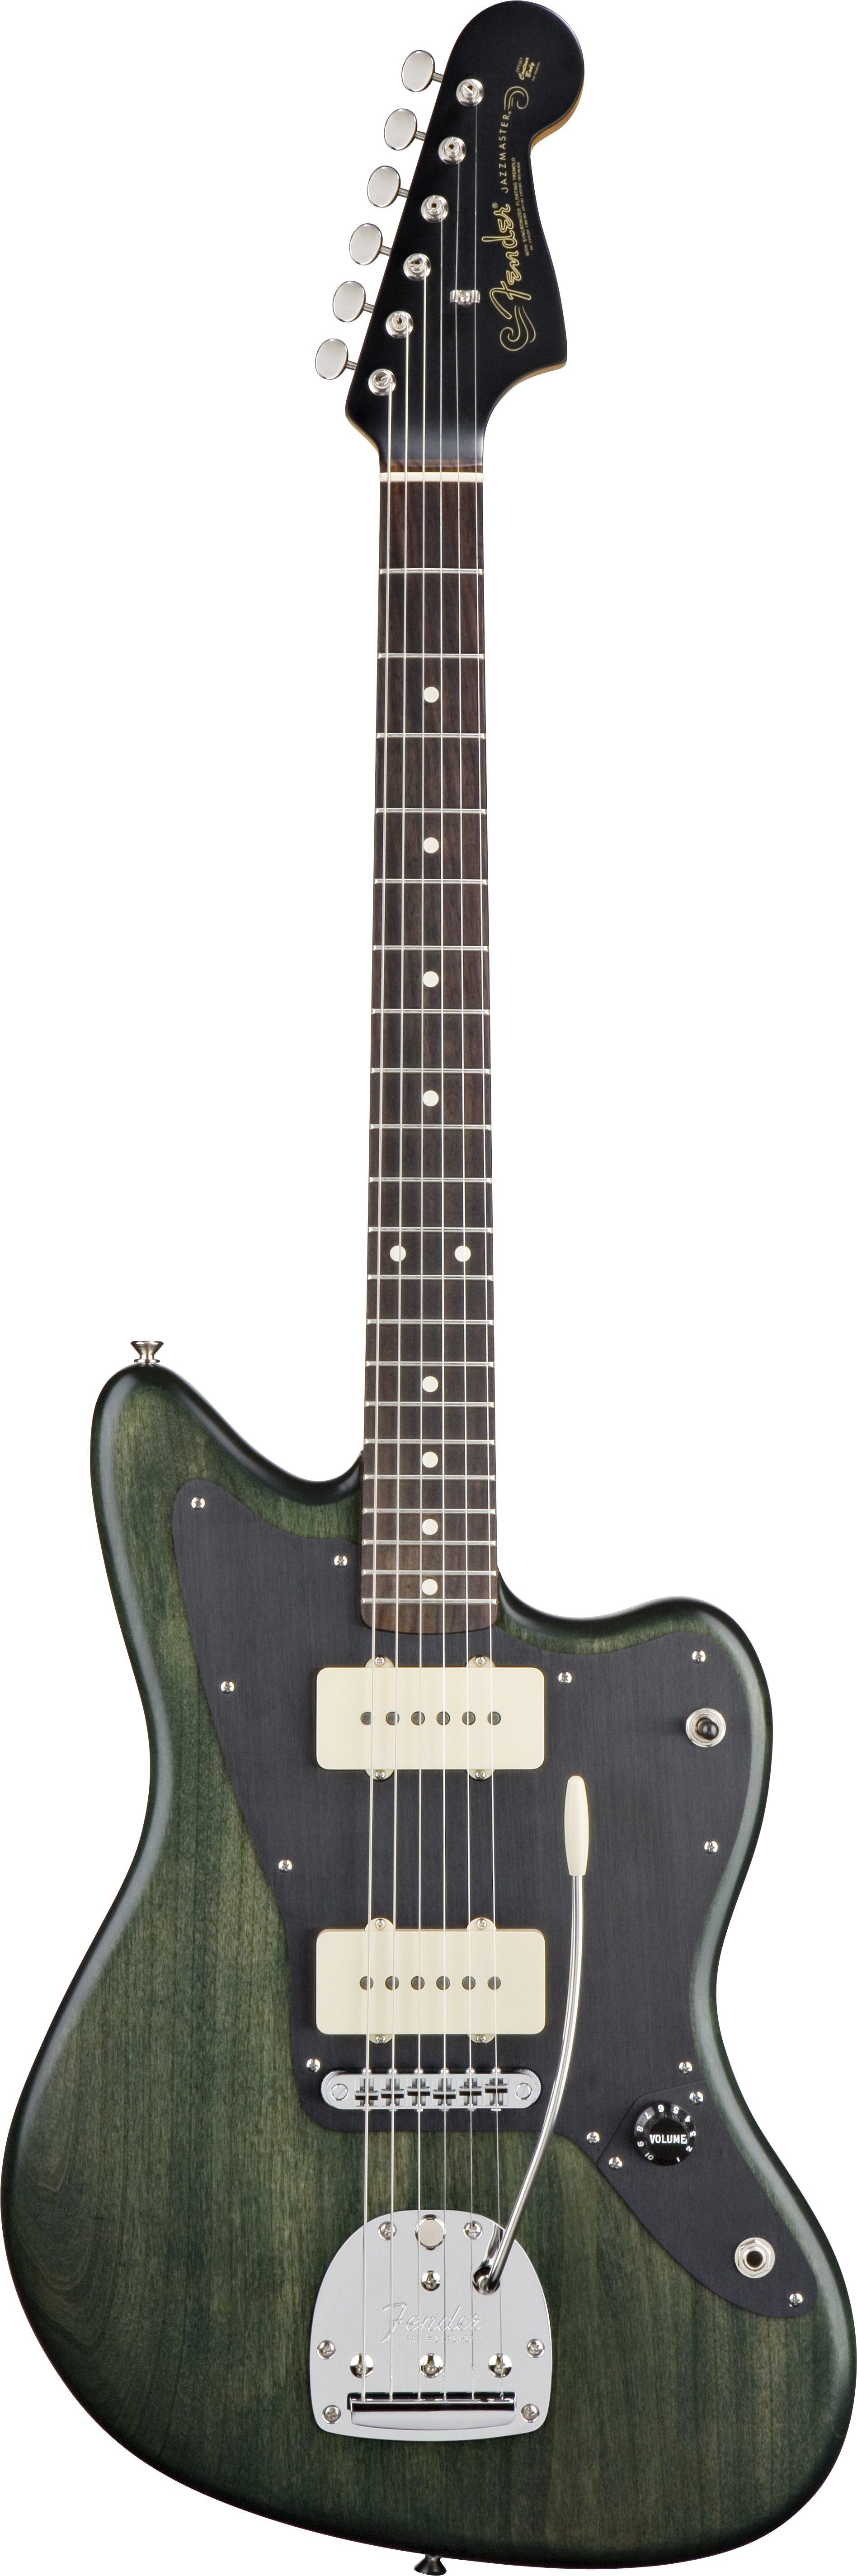 thurston moore signature jazzmaster guitars guitar fender electric guitar fender guitars. Black Bedroom Furniture Sets. Home Design Ideas